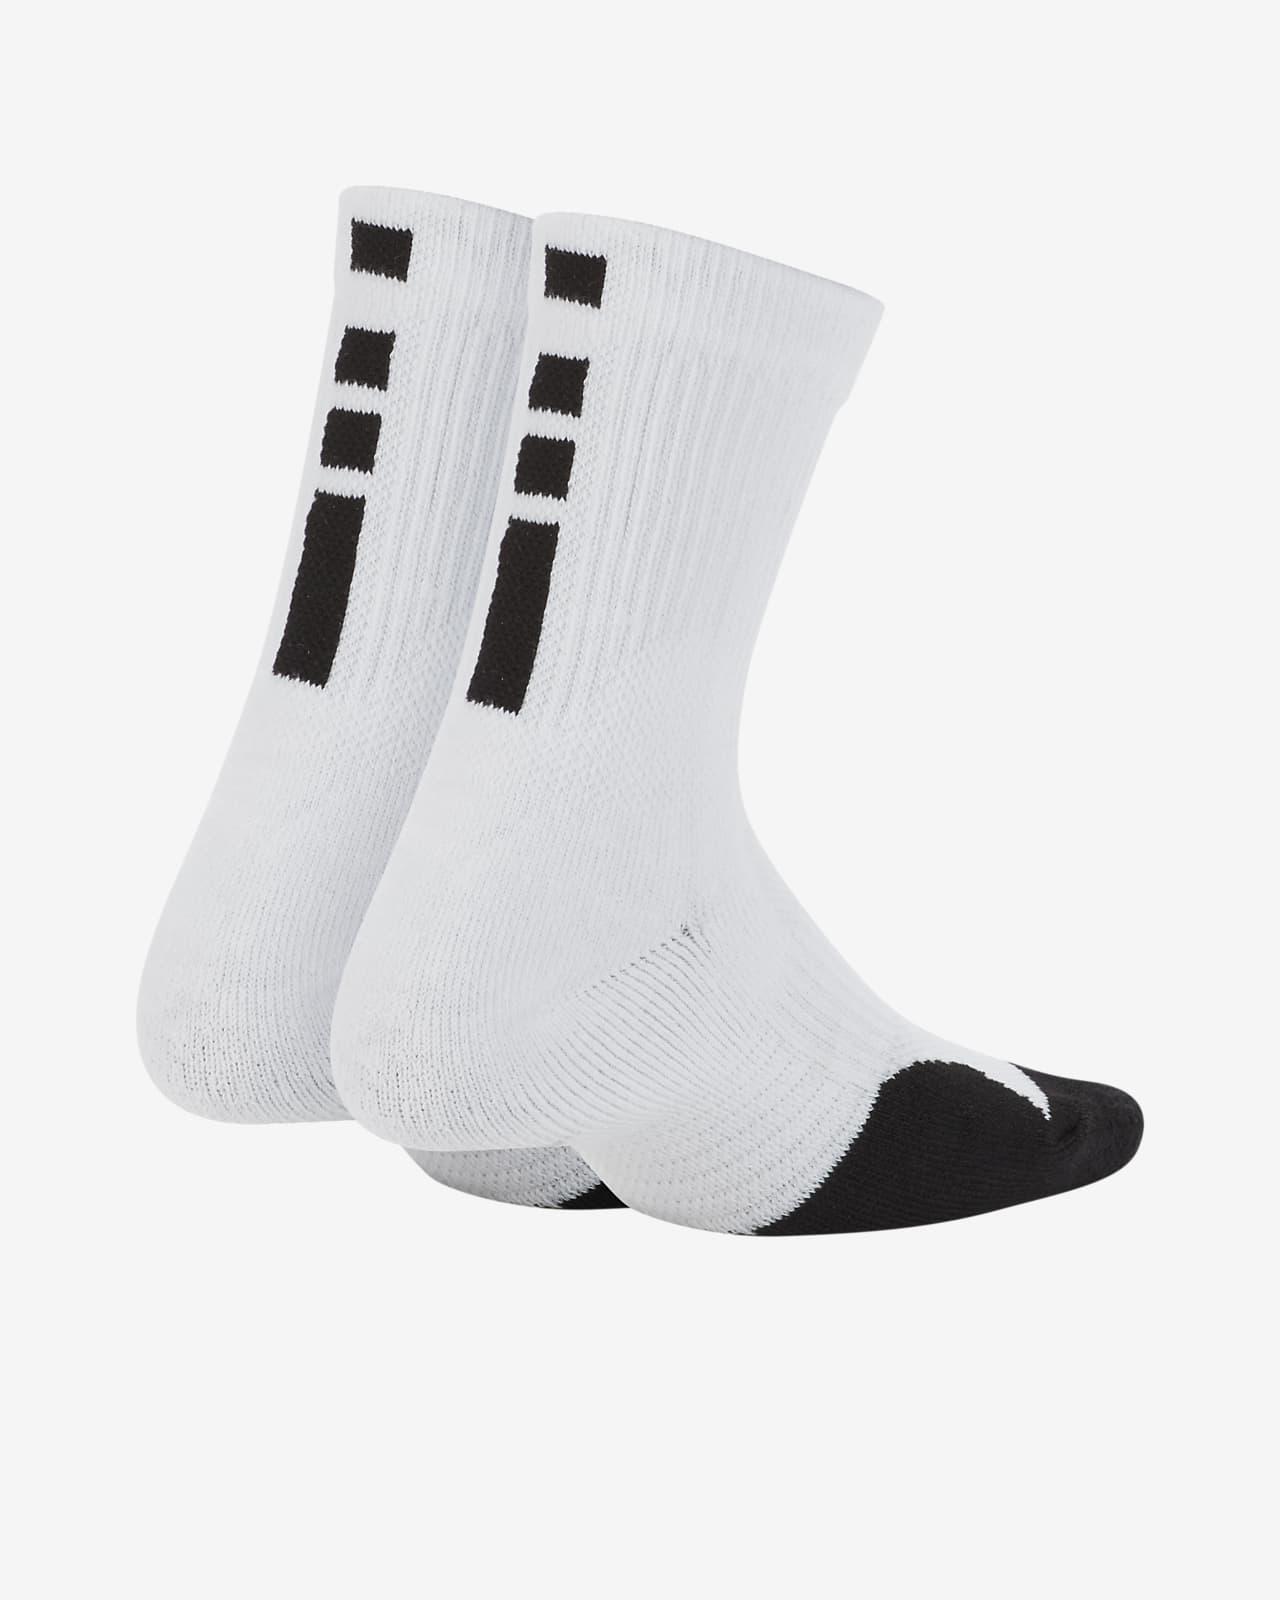 Calcetines largos para niños pequeños Nike Dri-FIT Elite (2 pares)